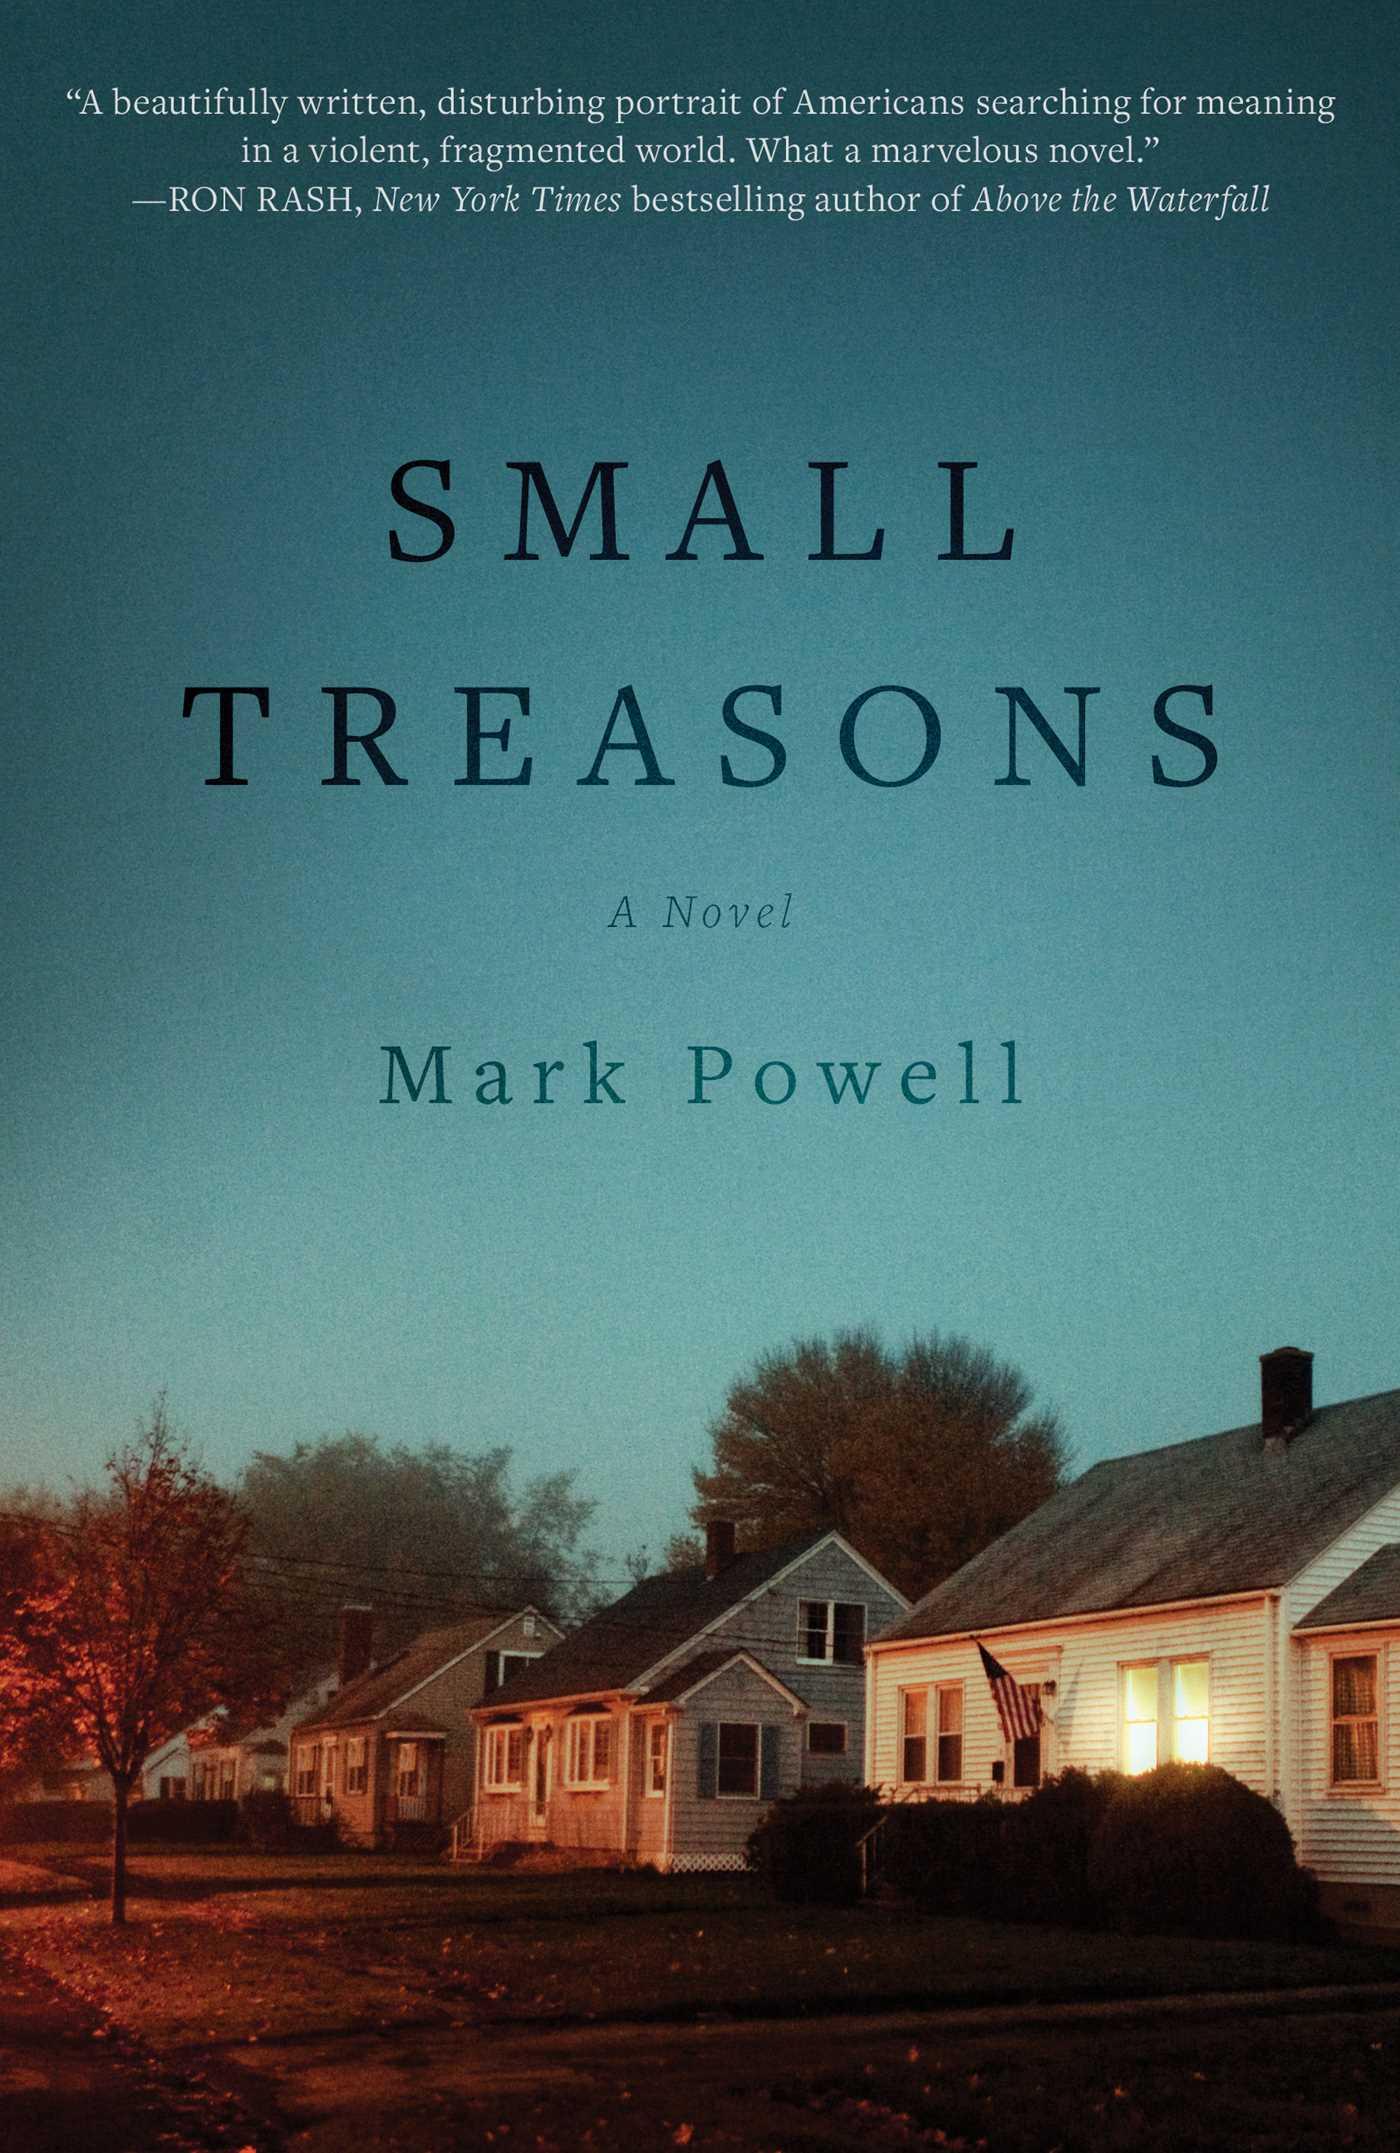 Small treasons 9781507203385 hr